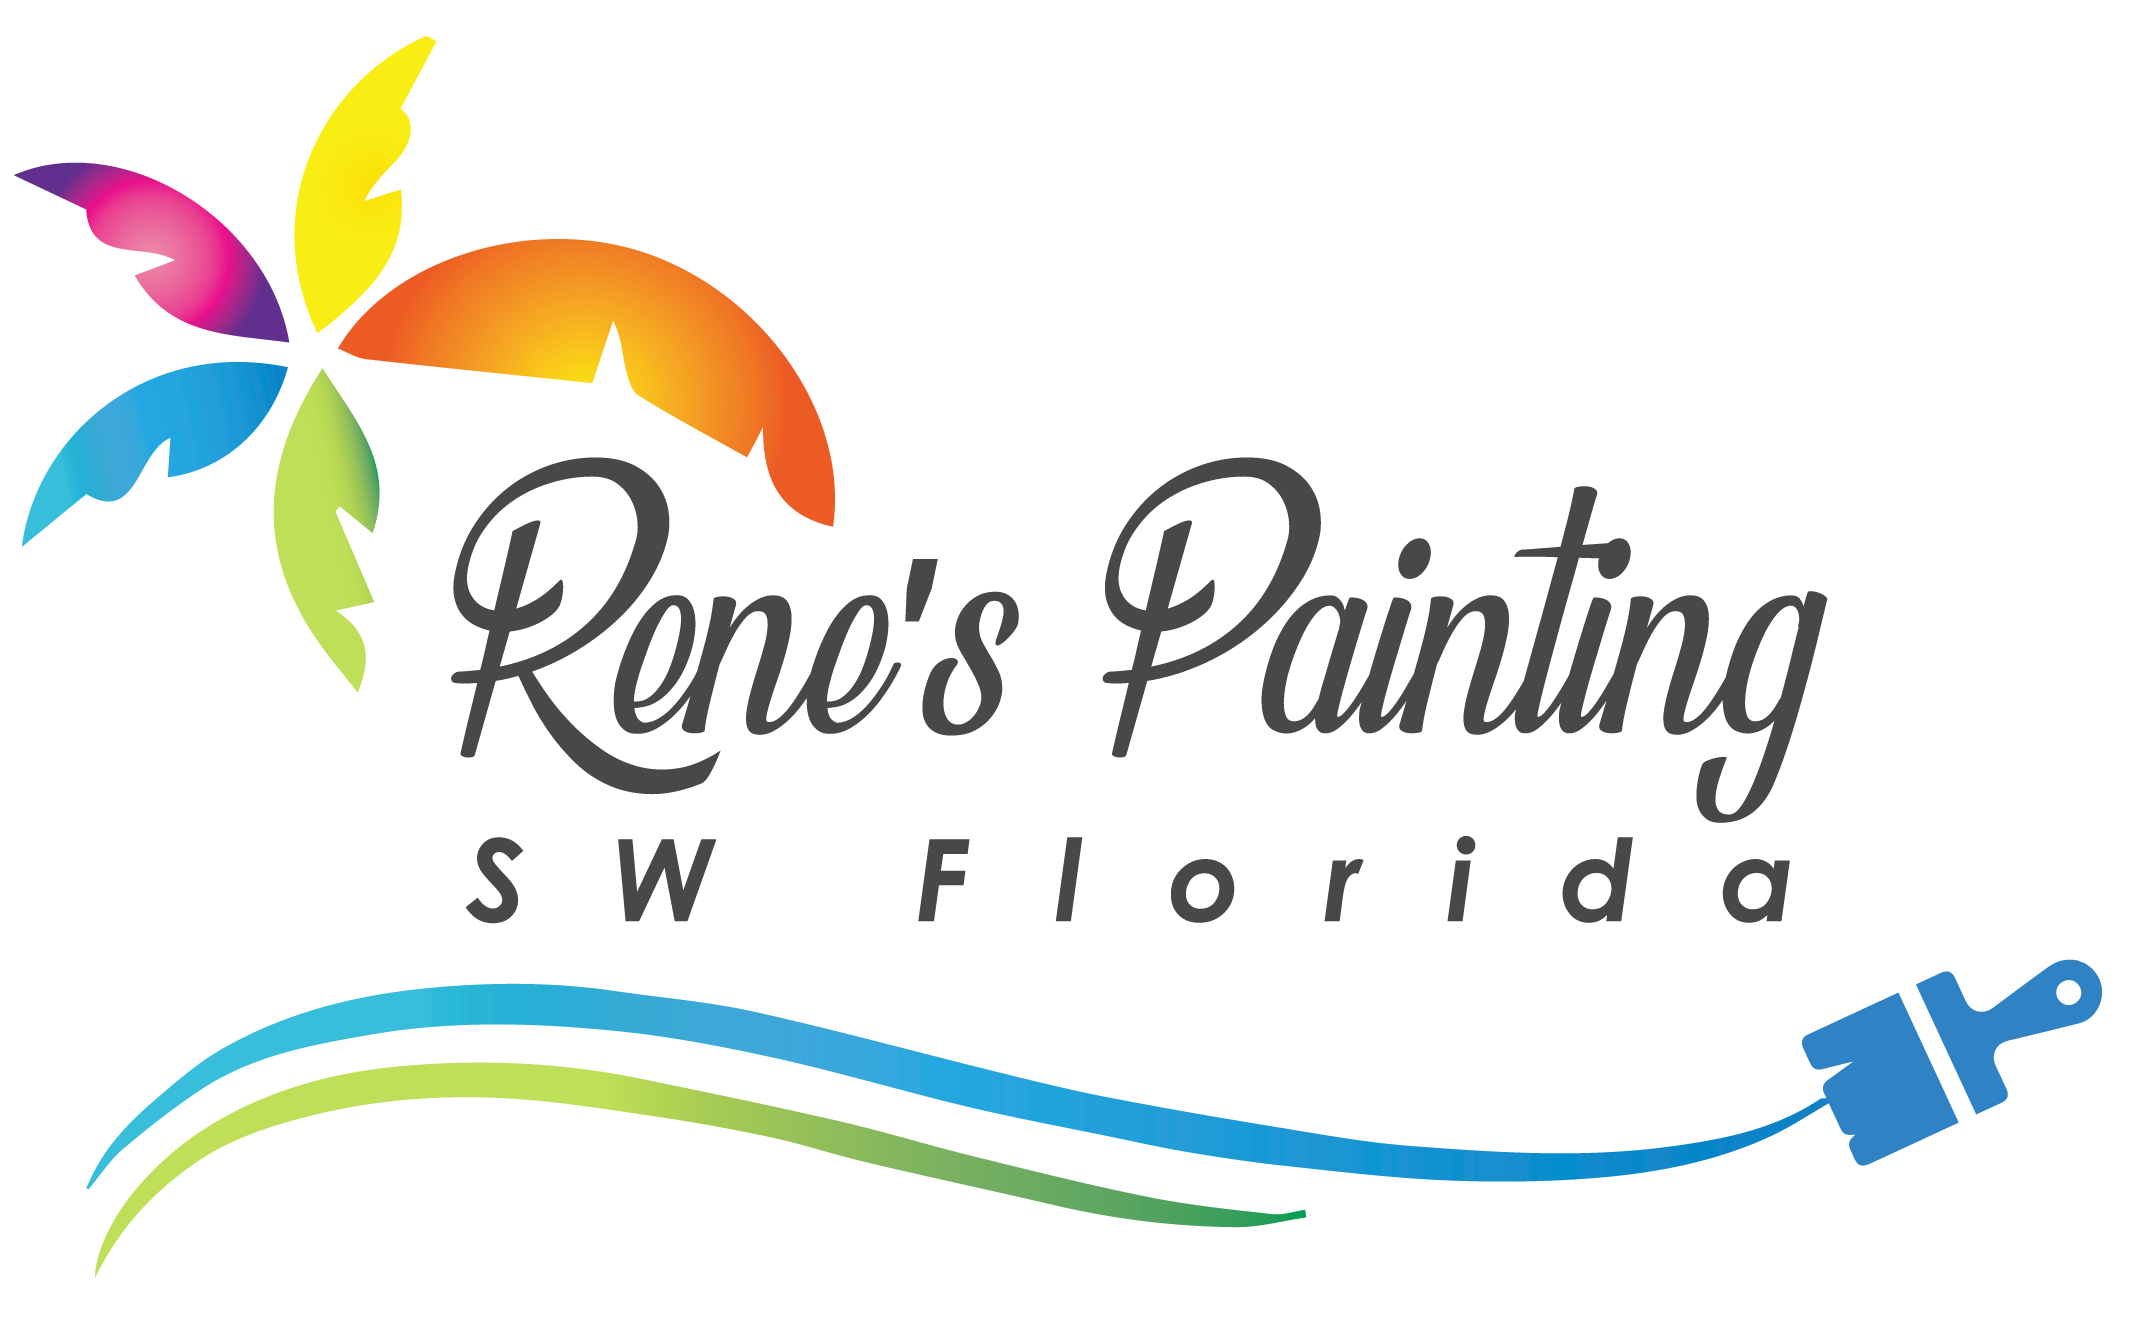 Rene's Painting